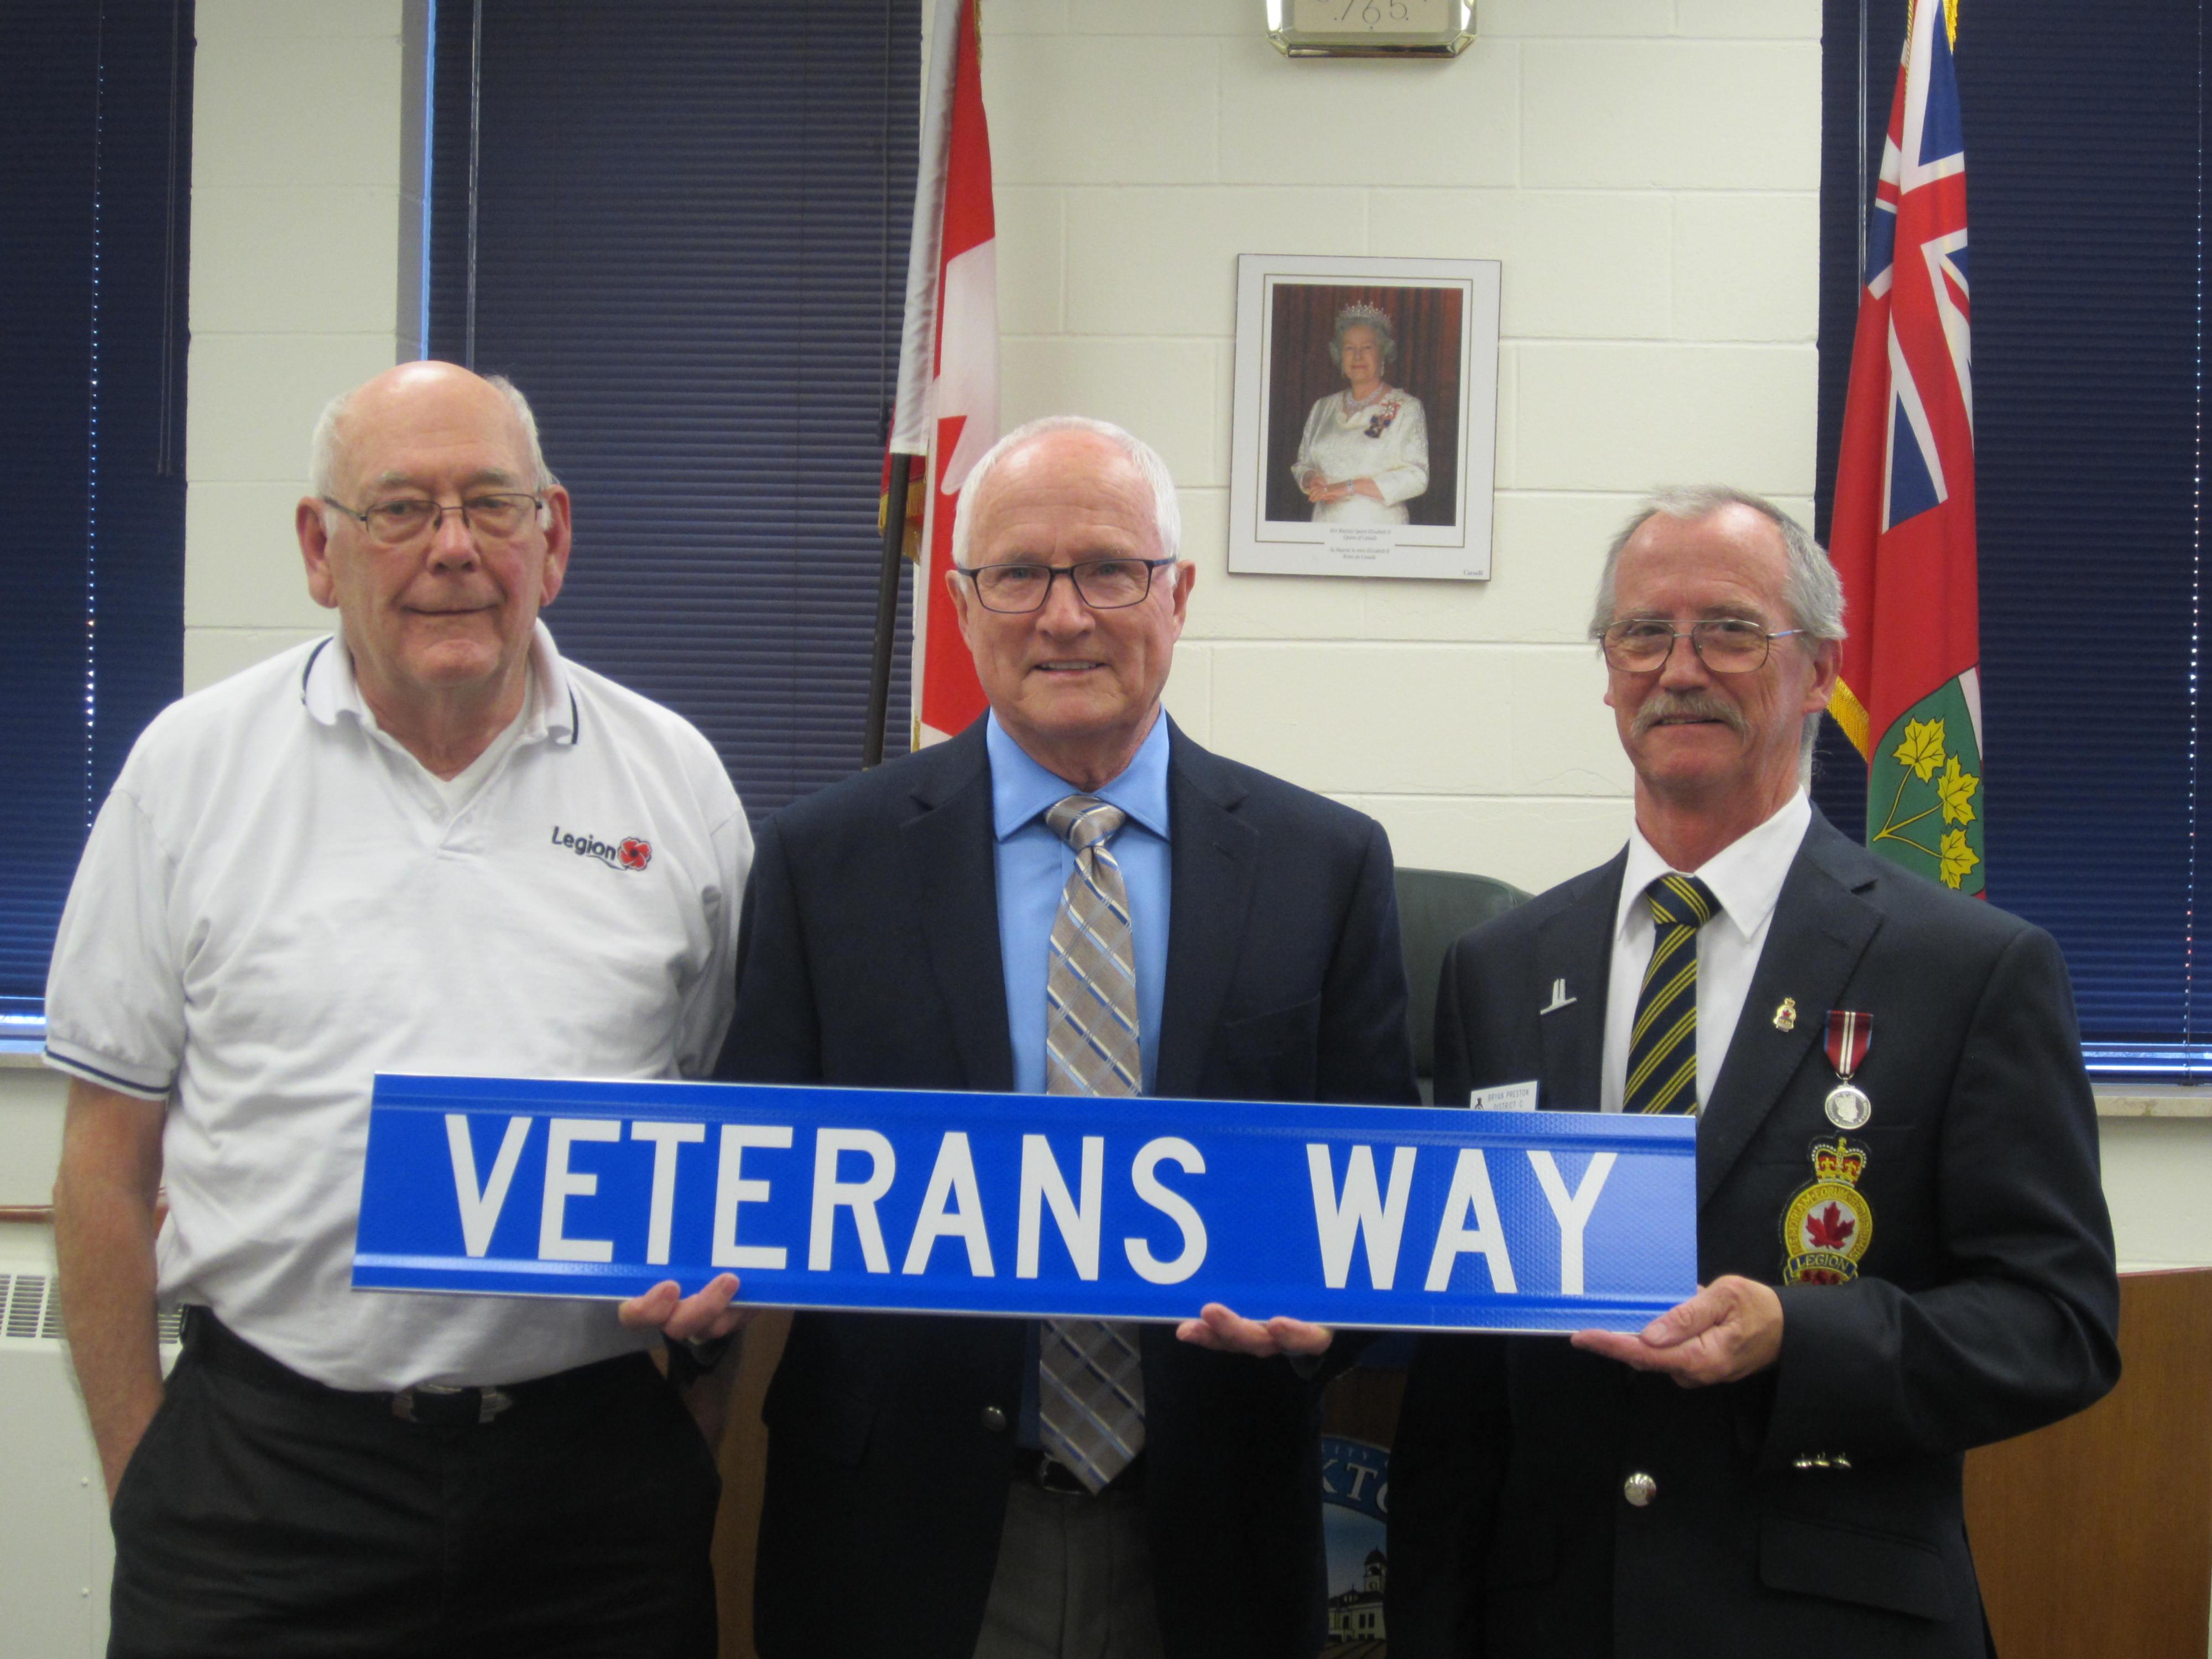 Veterans Way Signs - Bryan Preston, Dennis Taylor - May 8, 2017 (2)